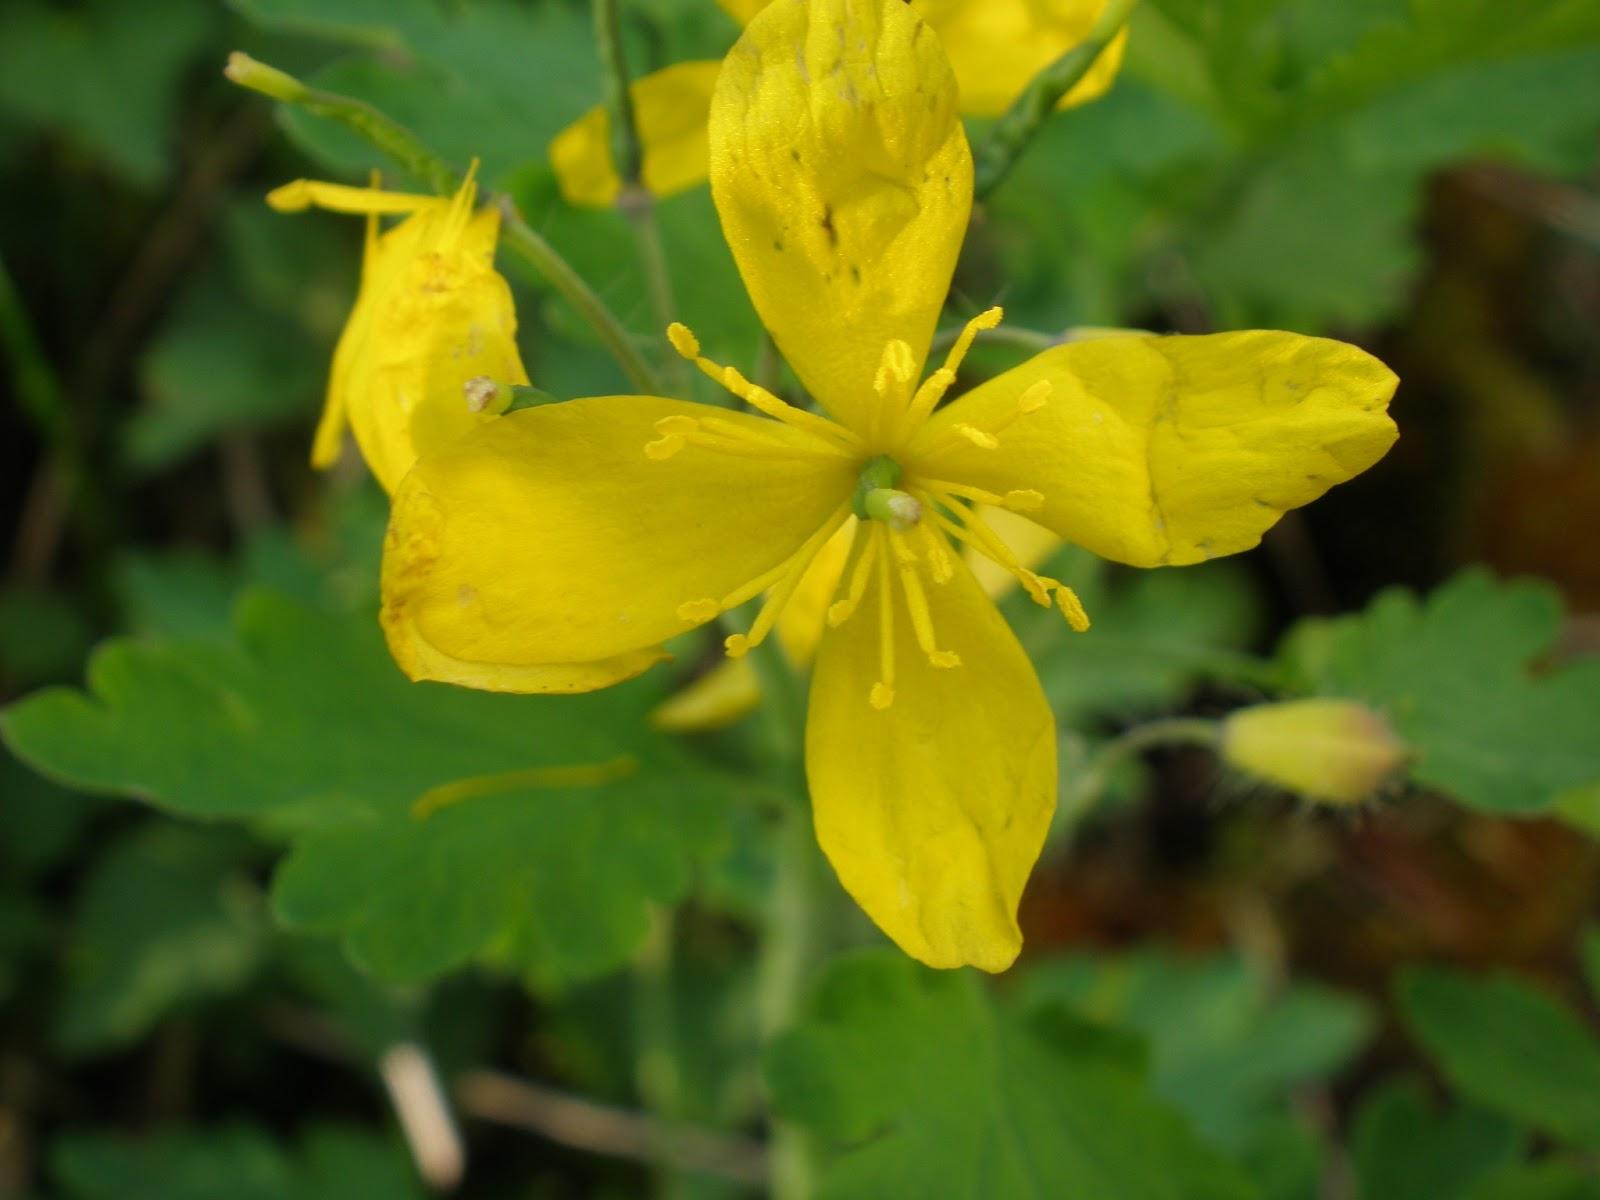 Fiori Gialli Per Verruche.Di Fiore In Fiore Celidonia